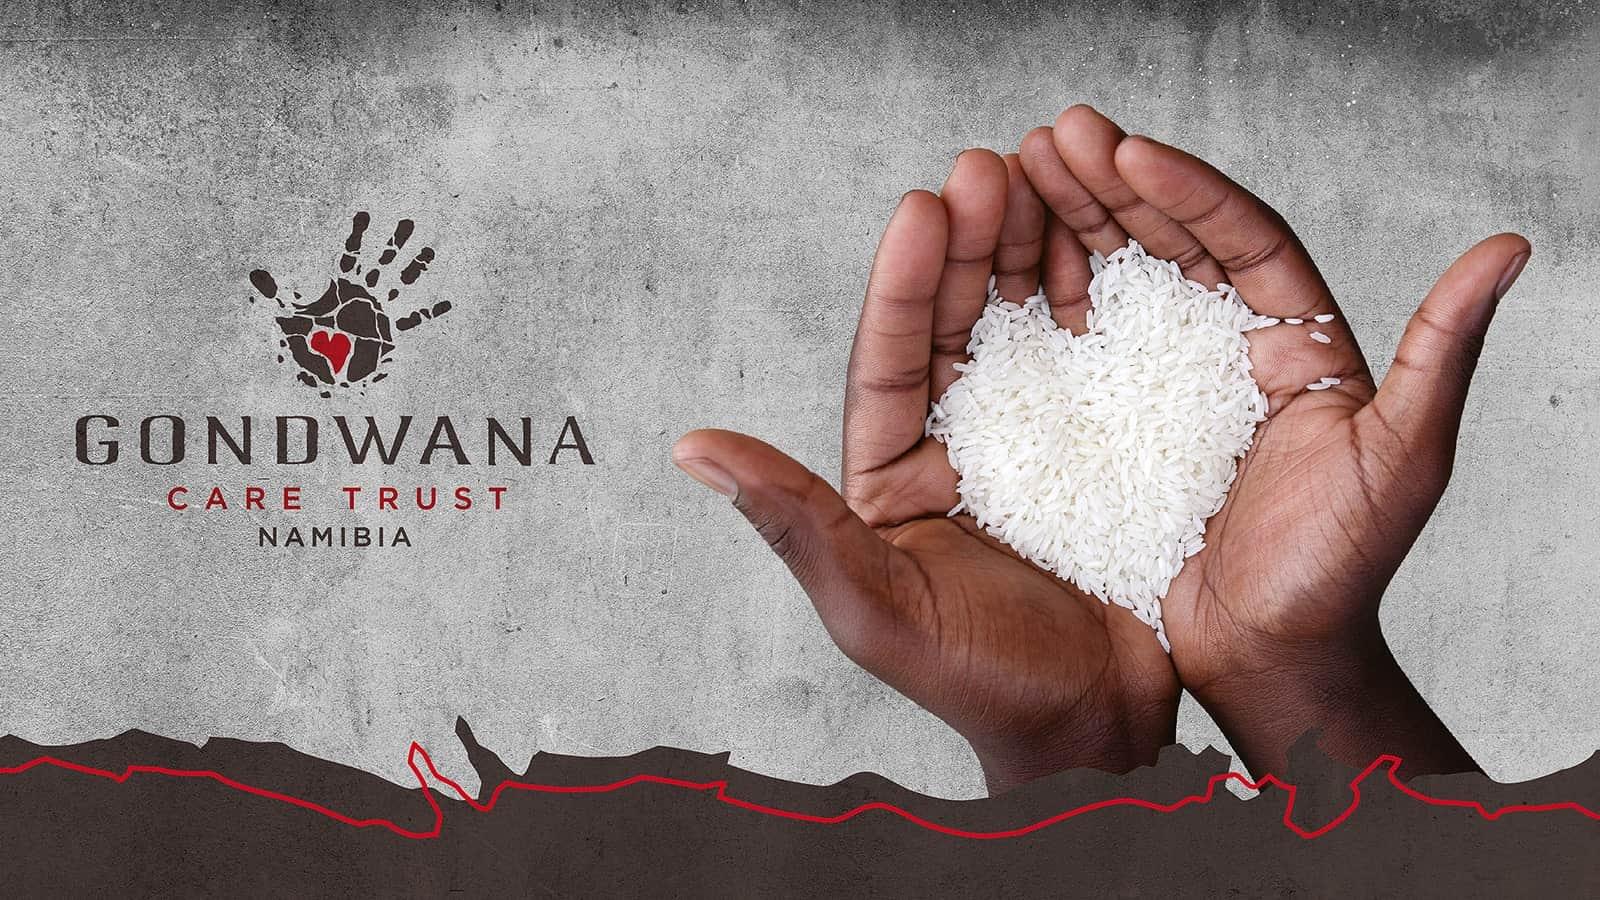 Gondwana-Care-Trust-Key-Visual